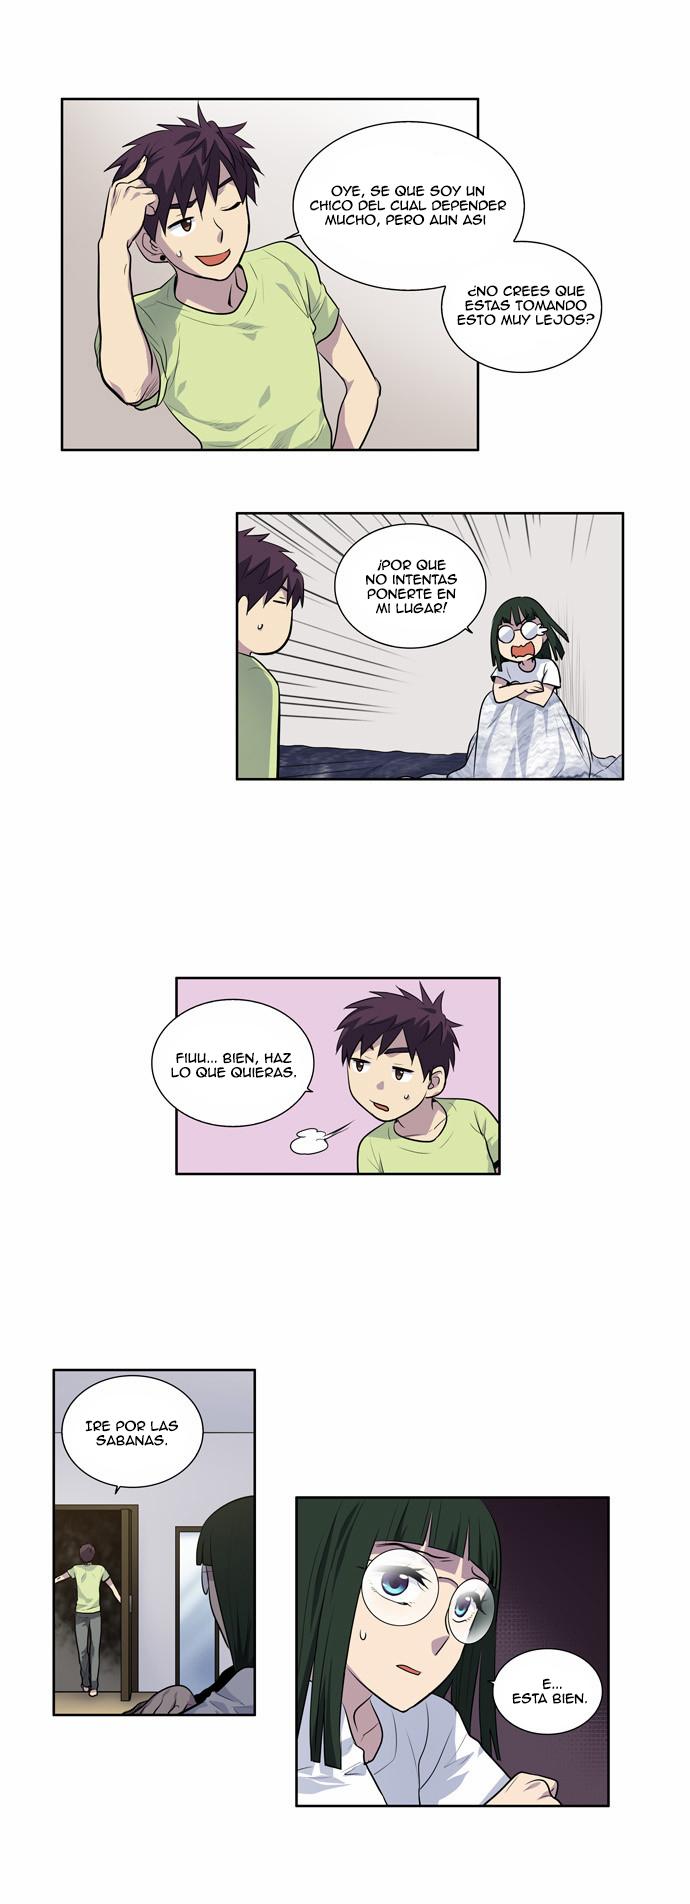 https://c5.ninemanga.com/es_manga/61/1725/453062/9f5c2f346de52c77f162838fdda18c06.jpg Page 3